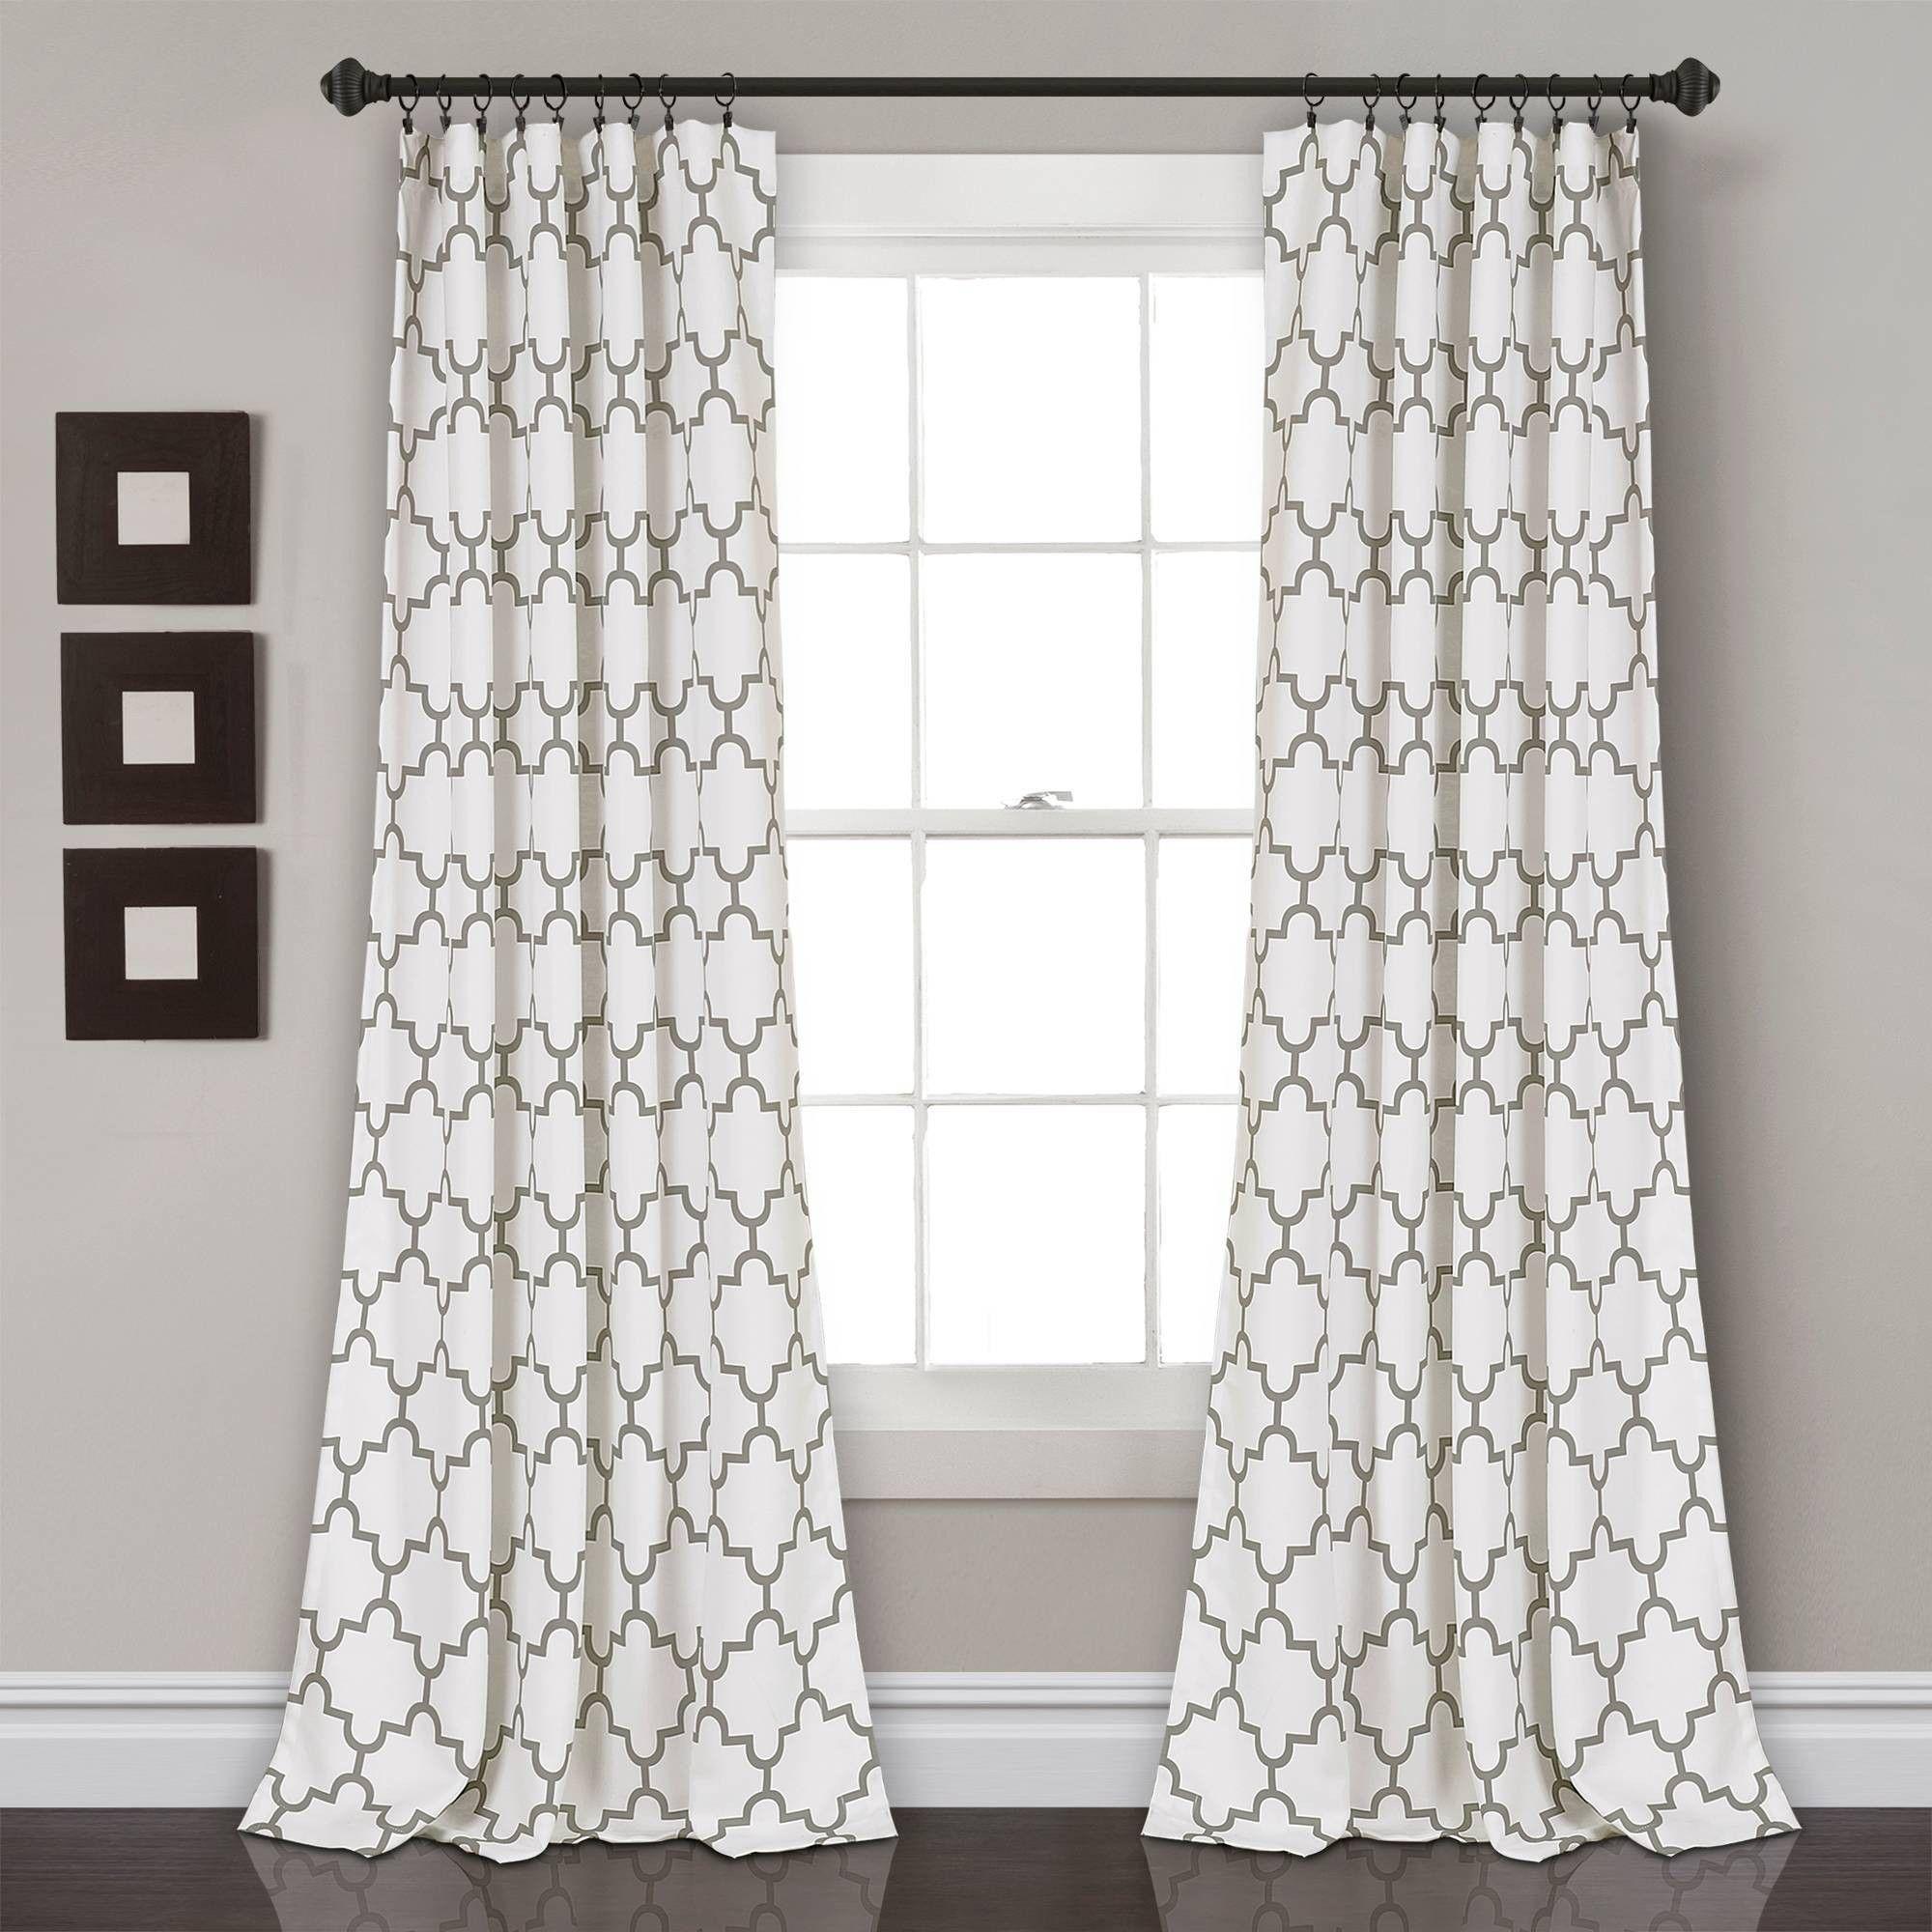 Set Of 2 84 X52 Bellagio Room Darkening Window Curtain Panels Gray Lush Décor In 2020 Living Room Decor Curtains Panel Curtains Curtains Living Room